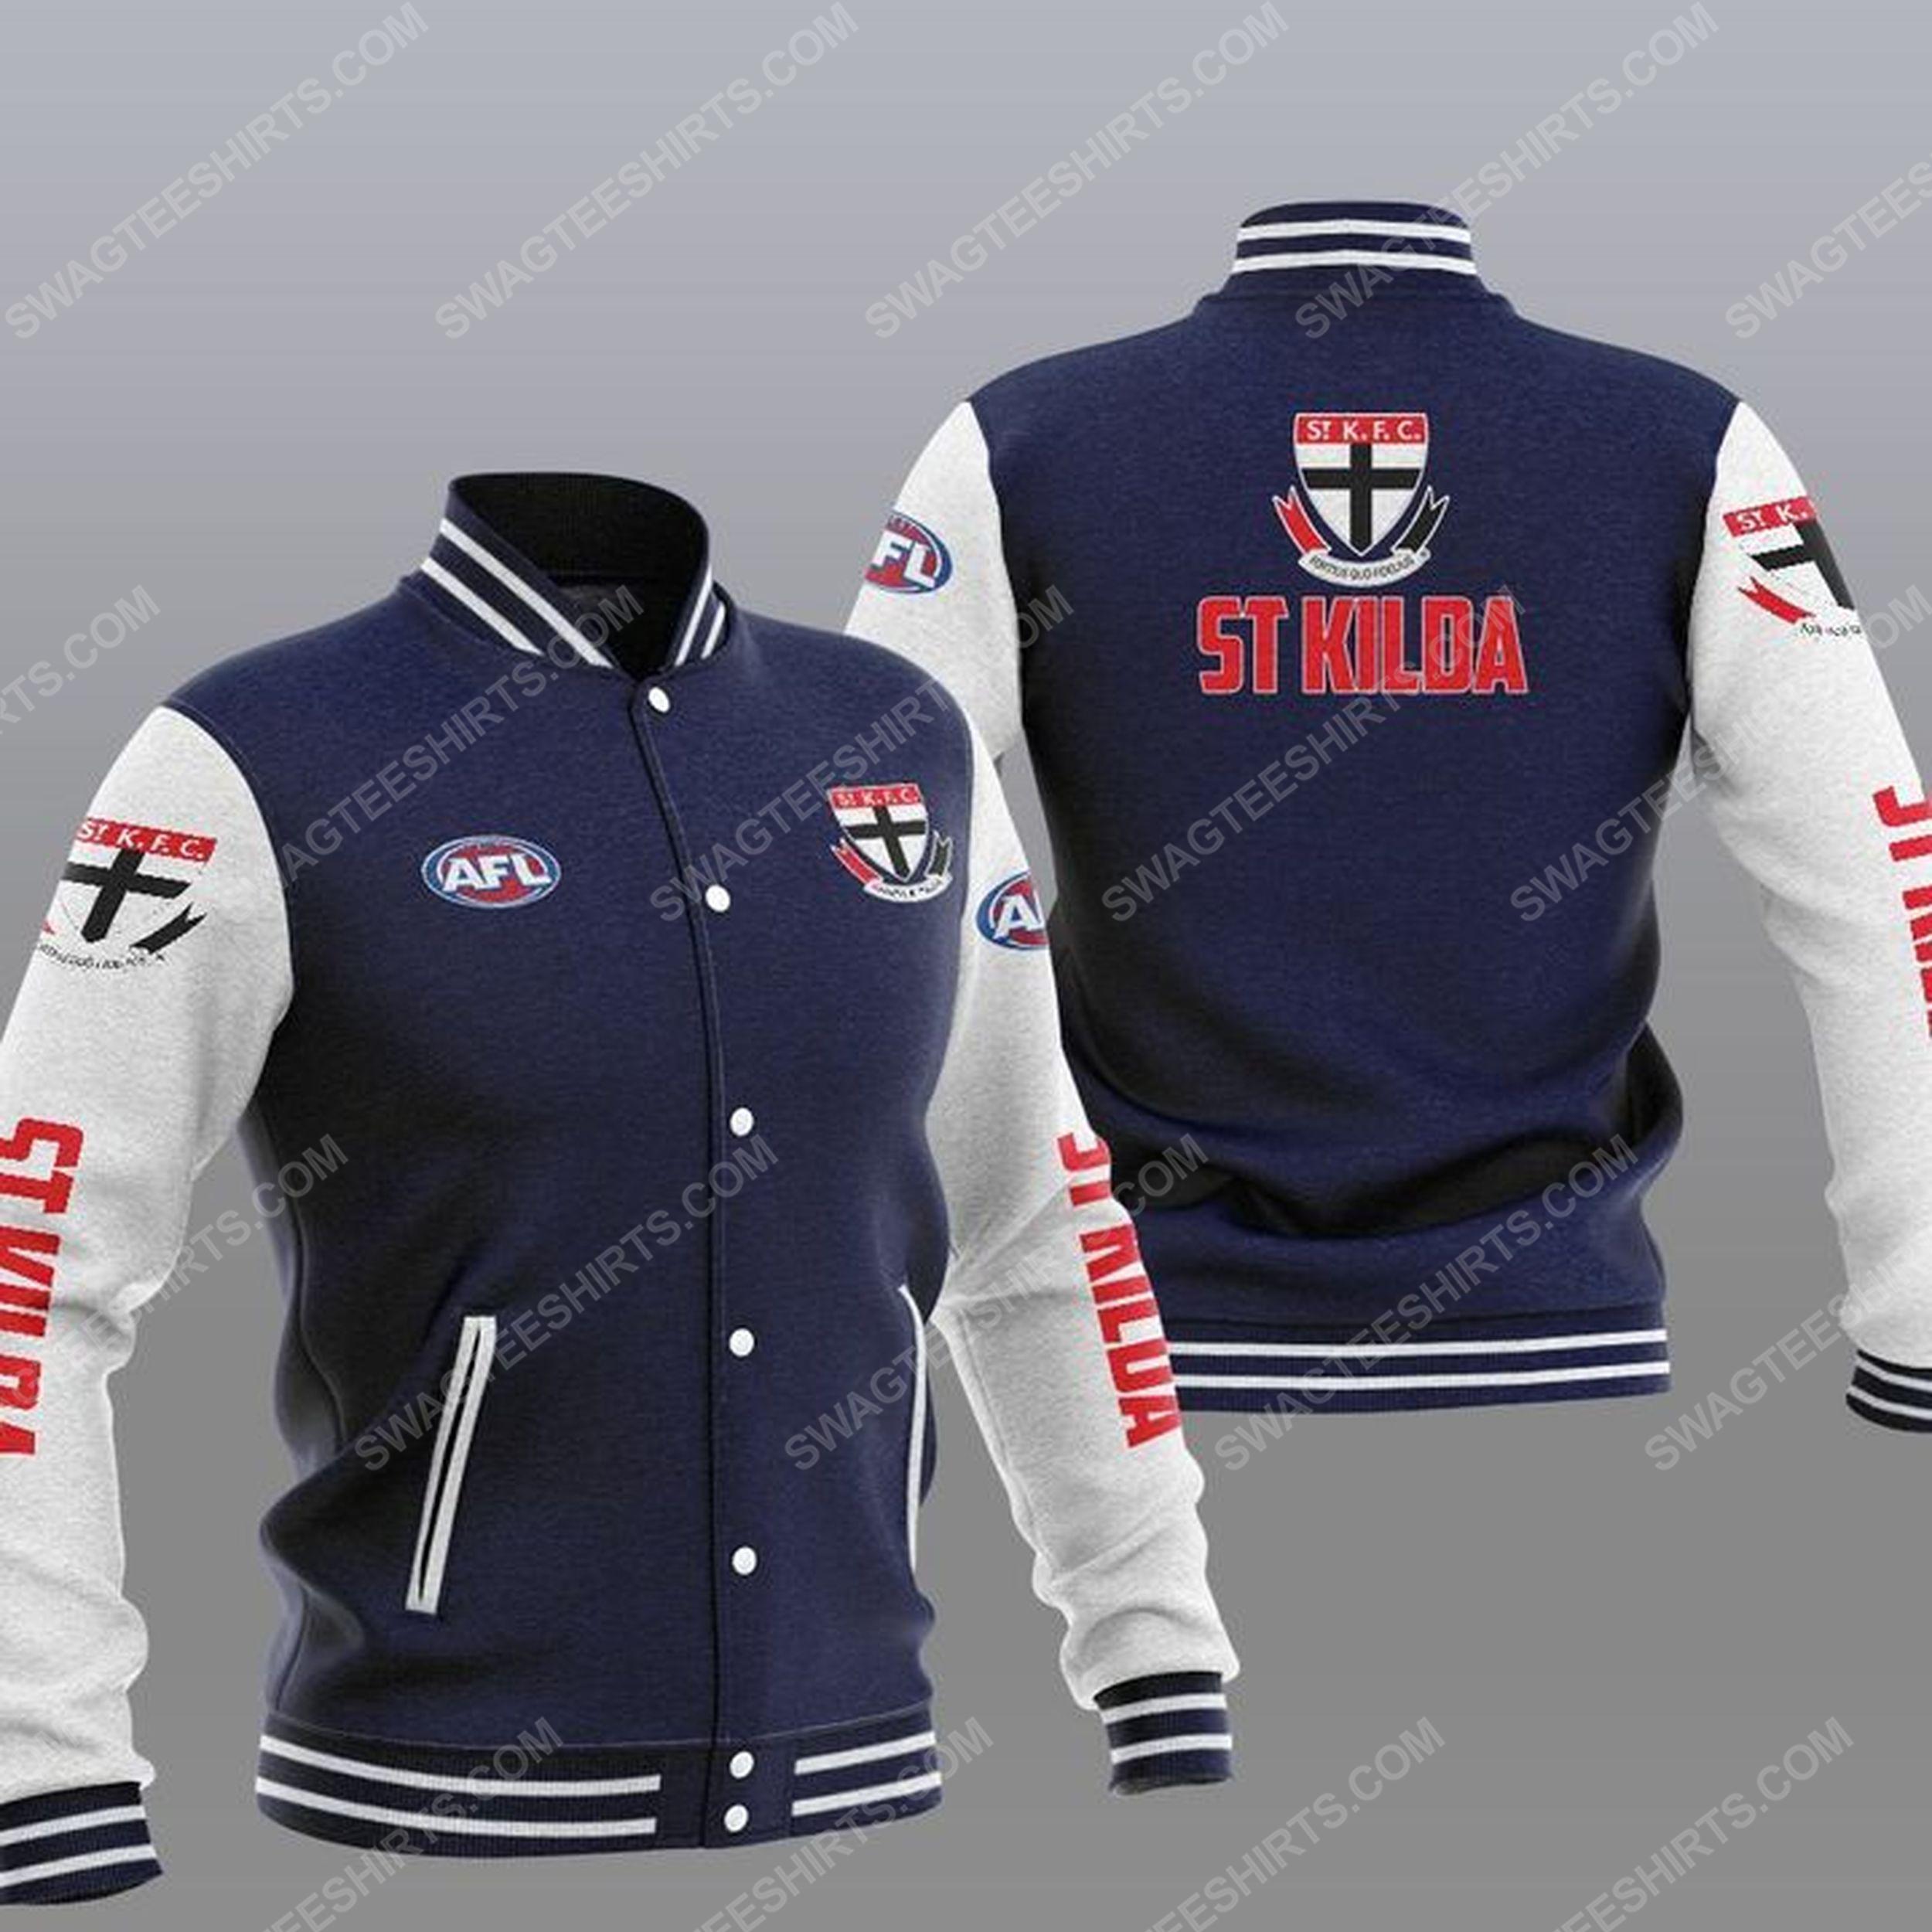 The st kilda football club all over print baseball jacket - navy 1